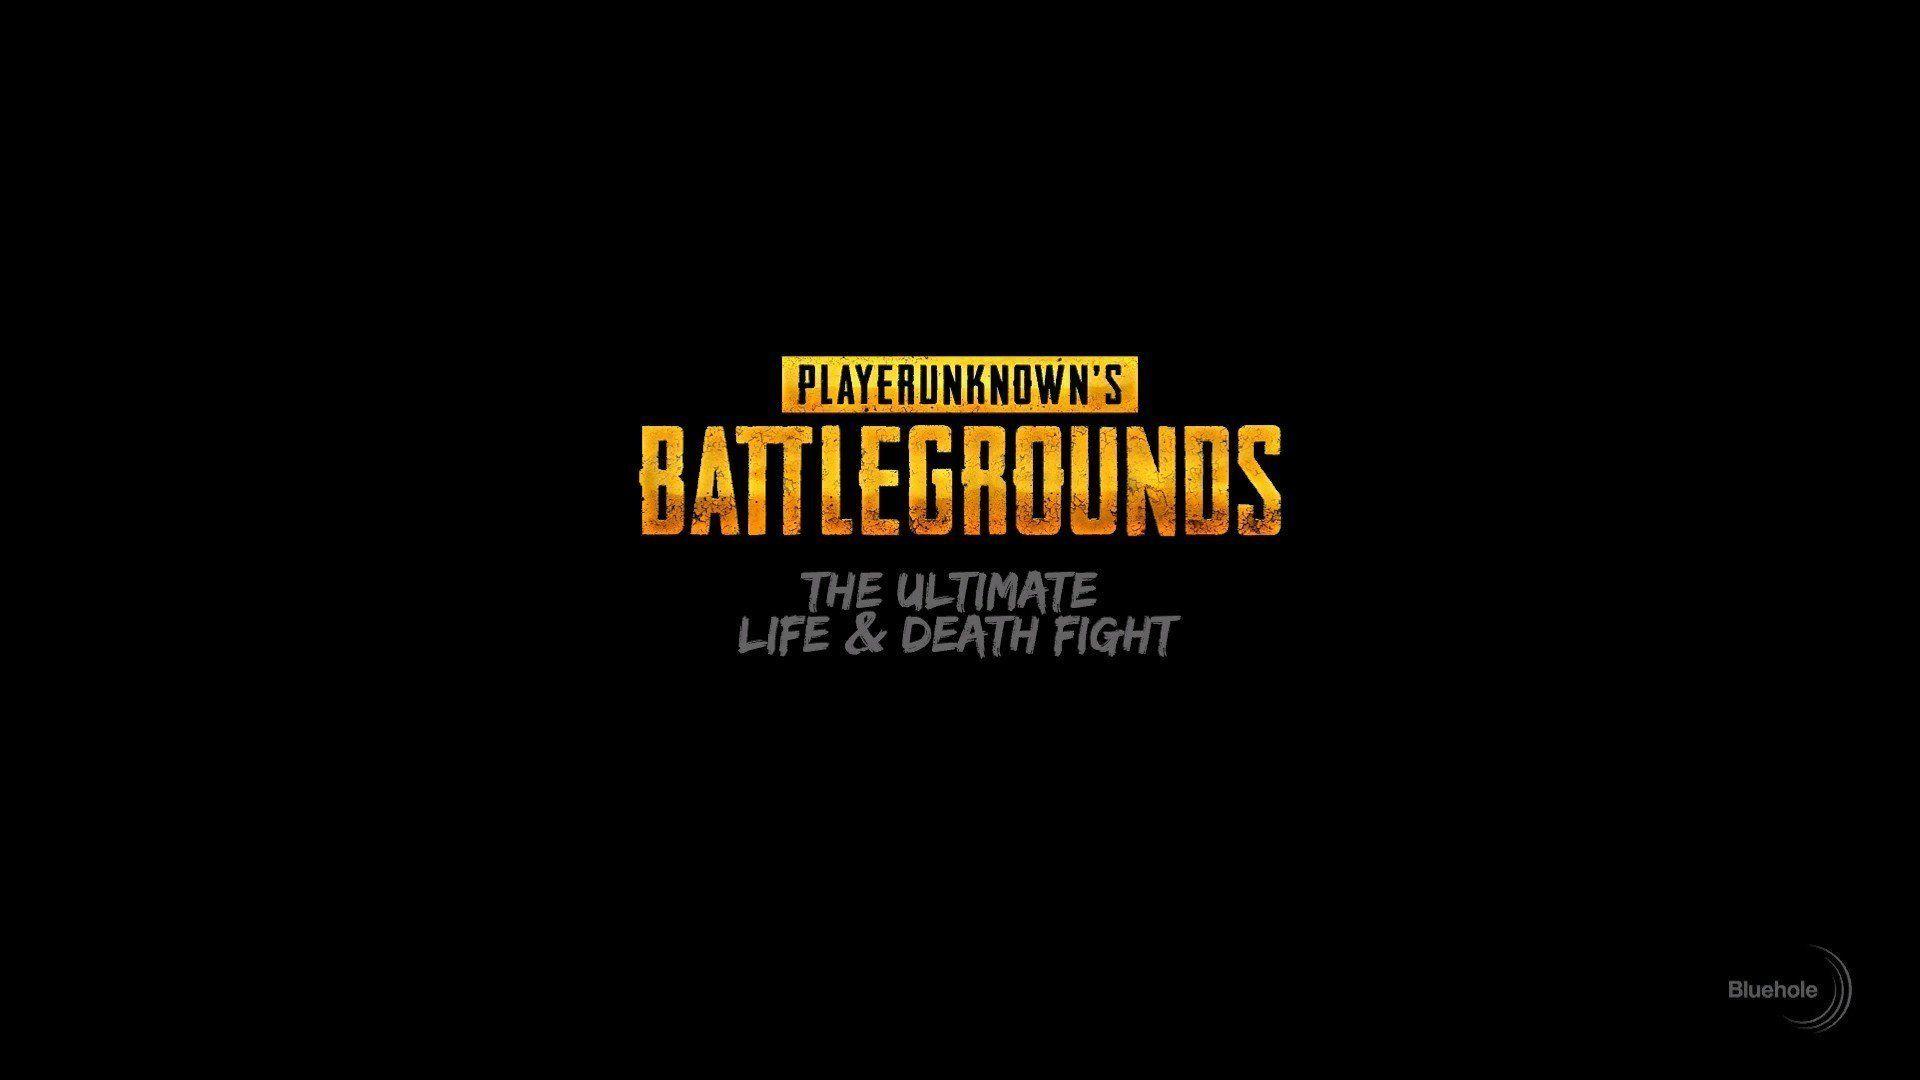 PUBG Player unknow battle grounds wallpaper PUBG Player